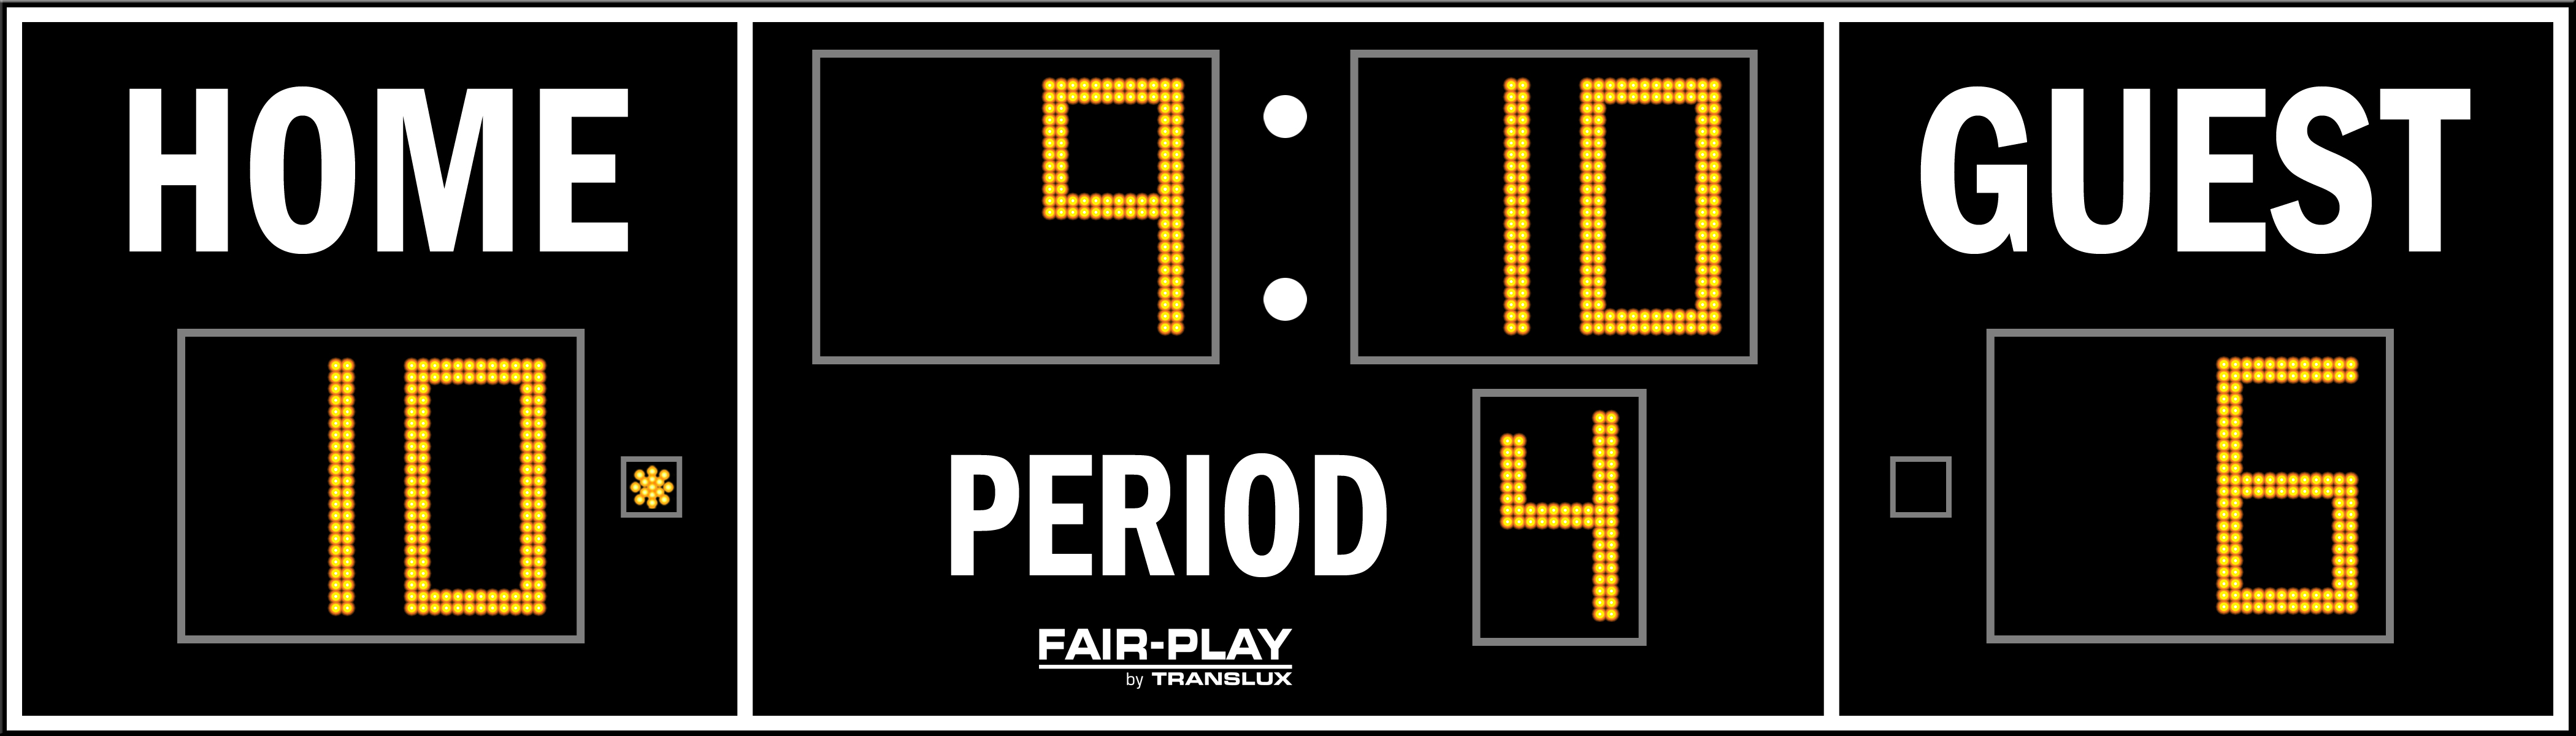 Football Score Clipart.